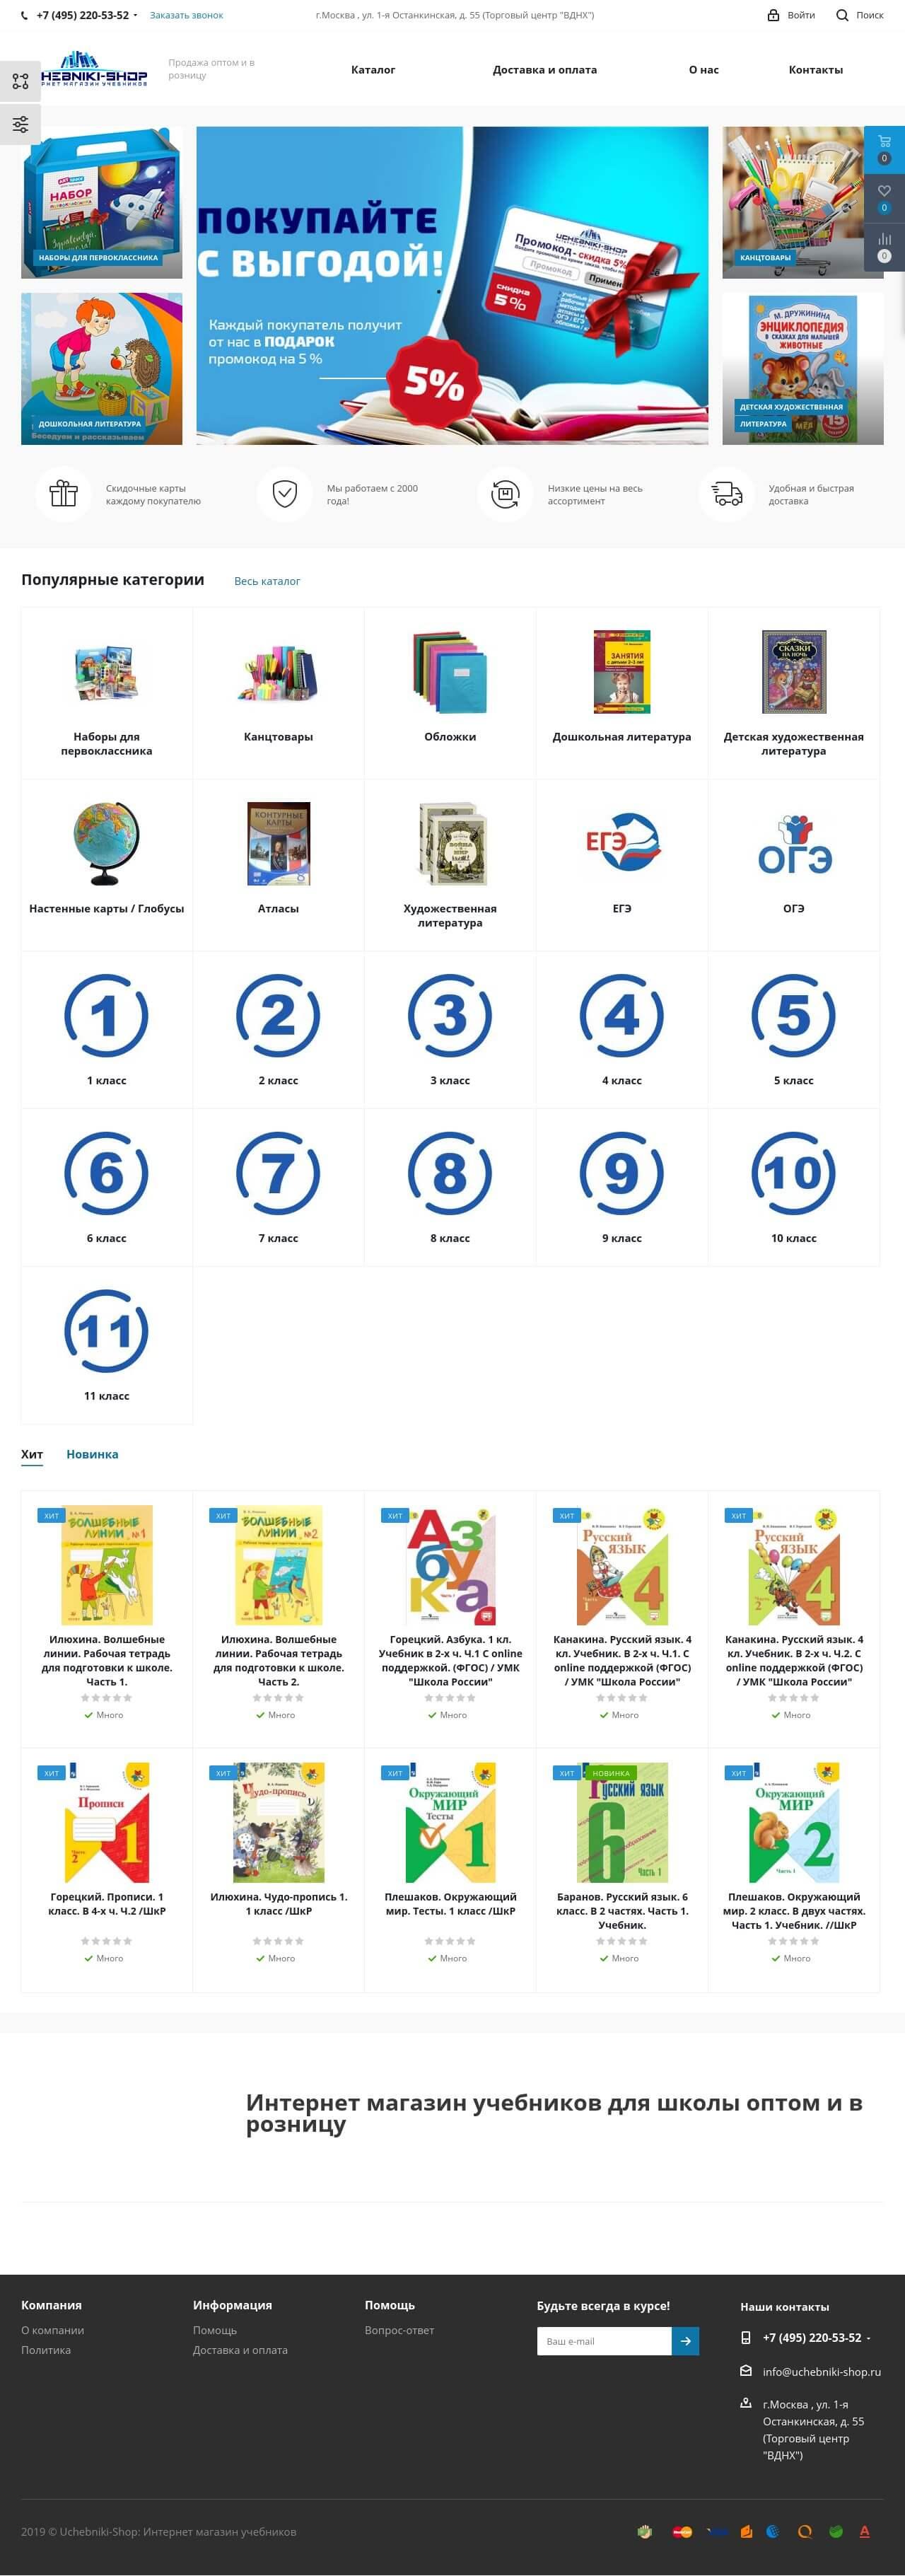 Портфолио интернет магазин учебники шоп